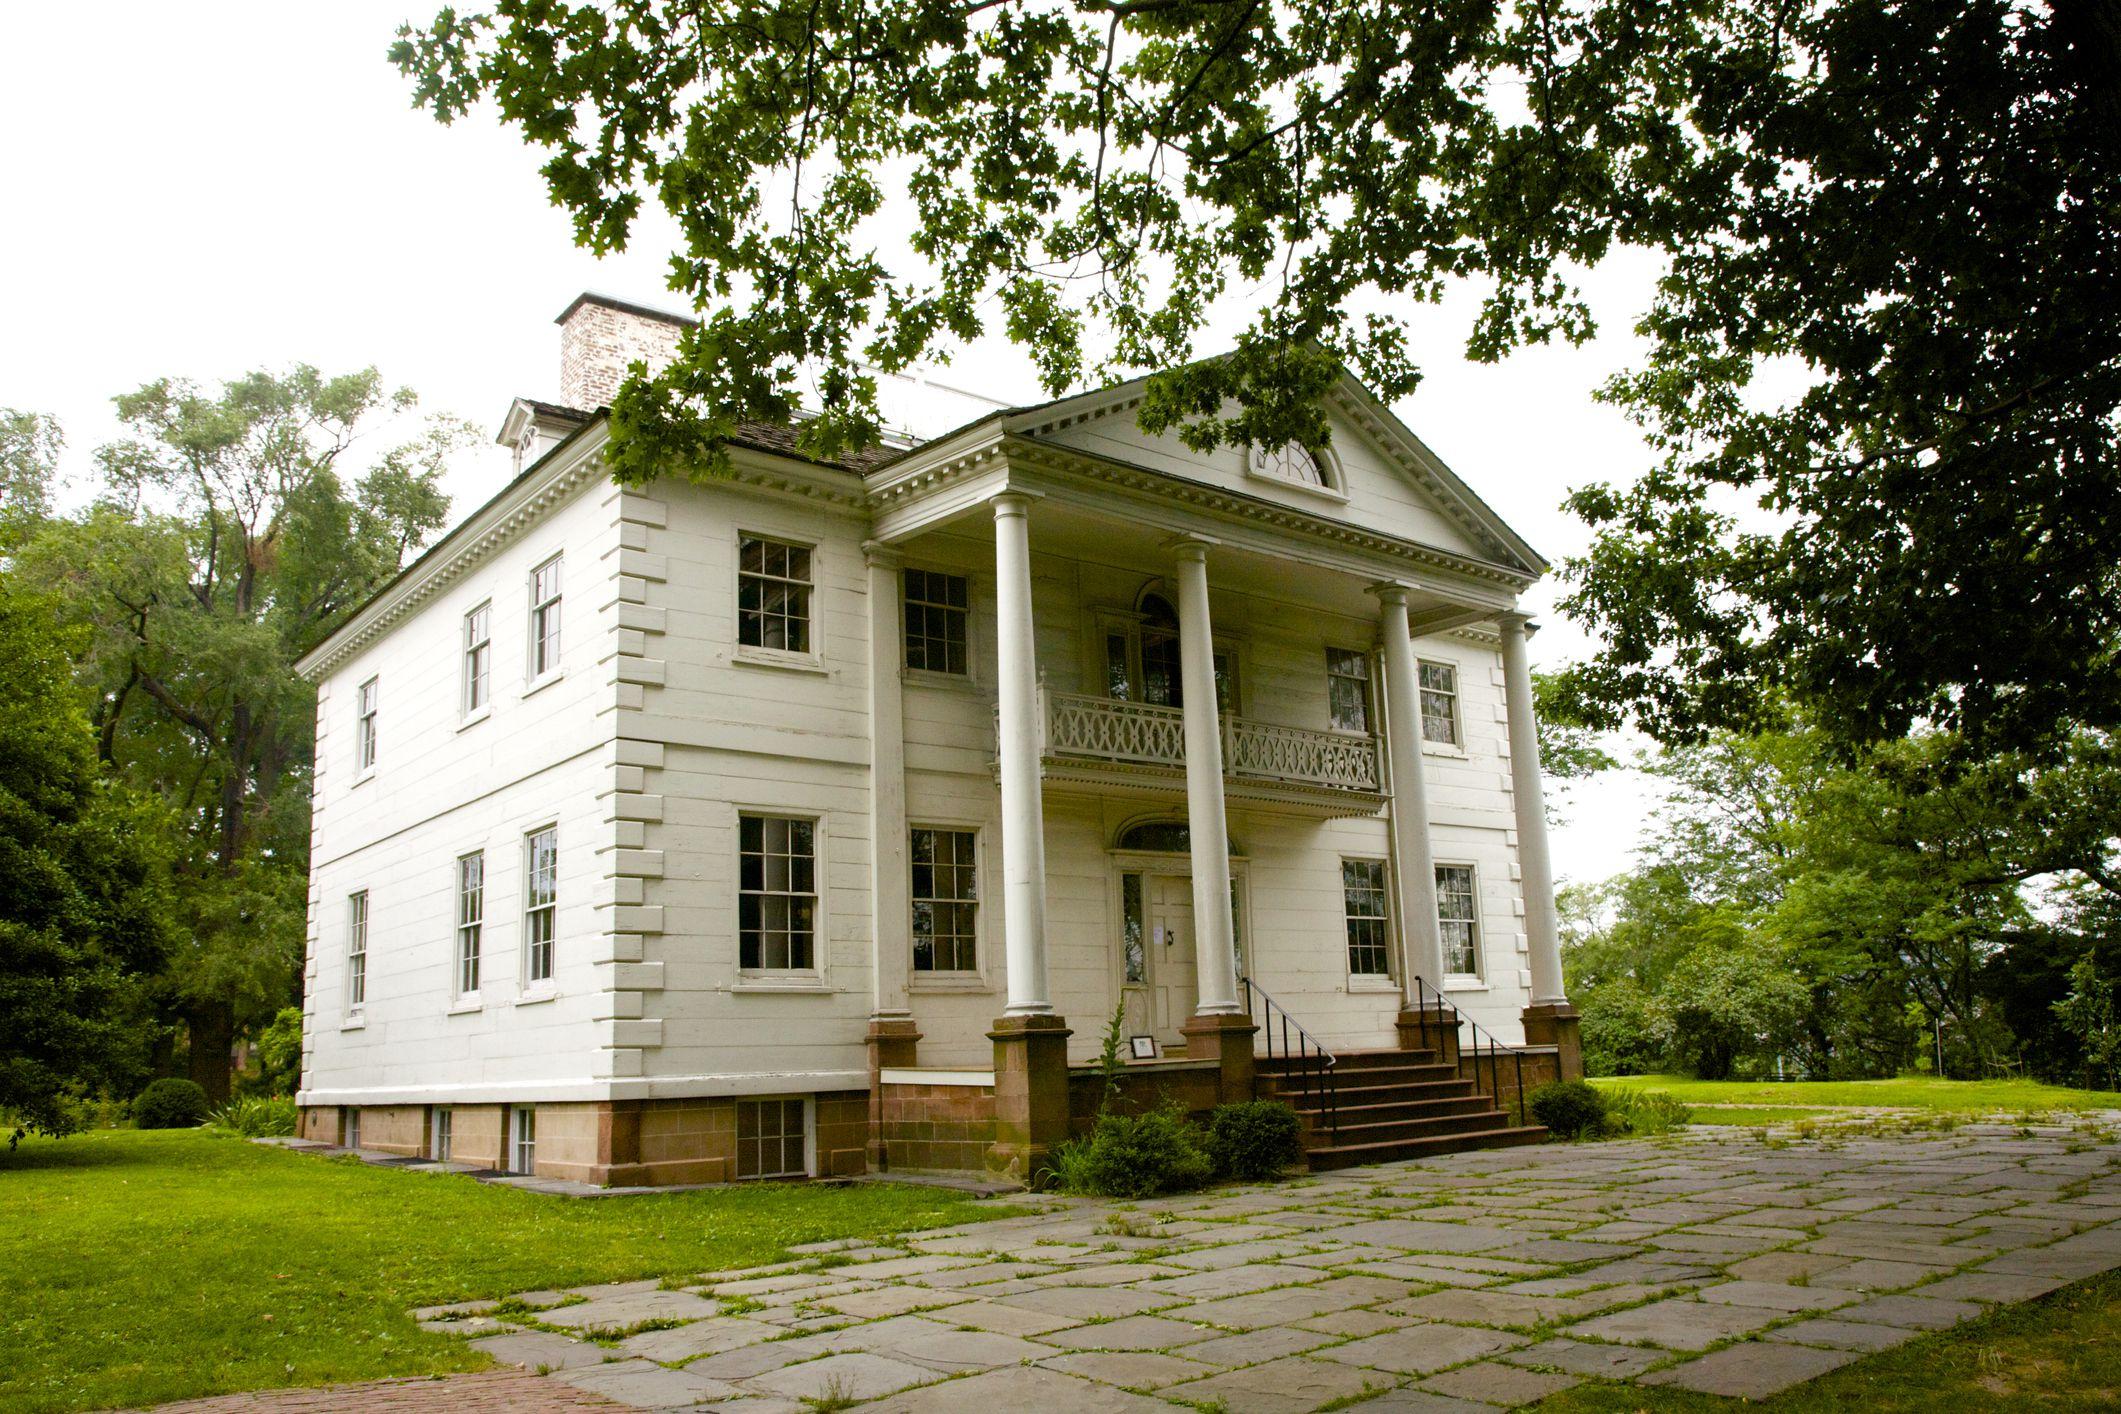 Historic Morris-Jumel Mansion